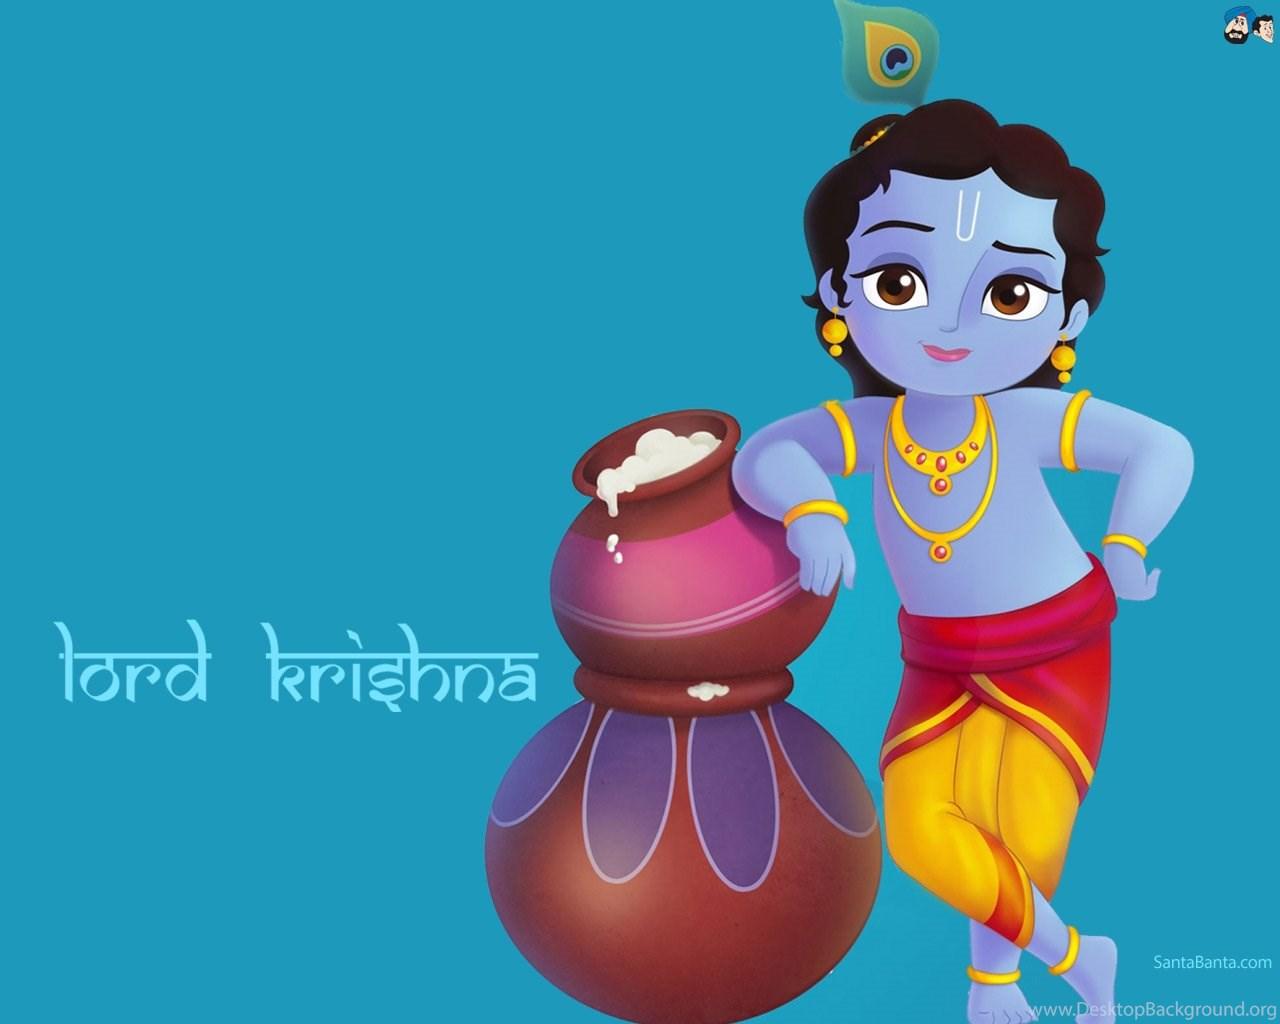 Santa banta bal krishna wallpapers hd free download desktop background widescreen voltagebd Image collections